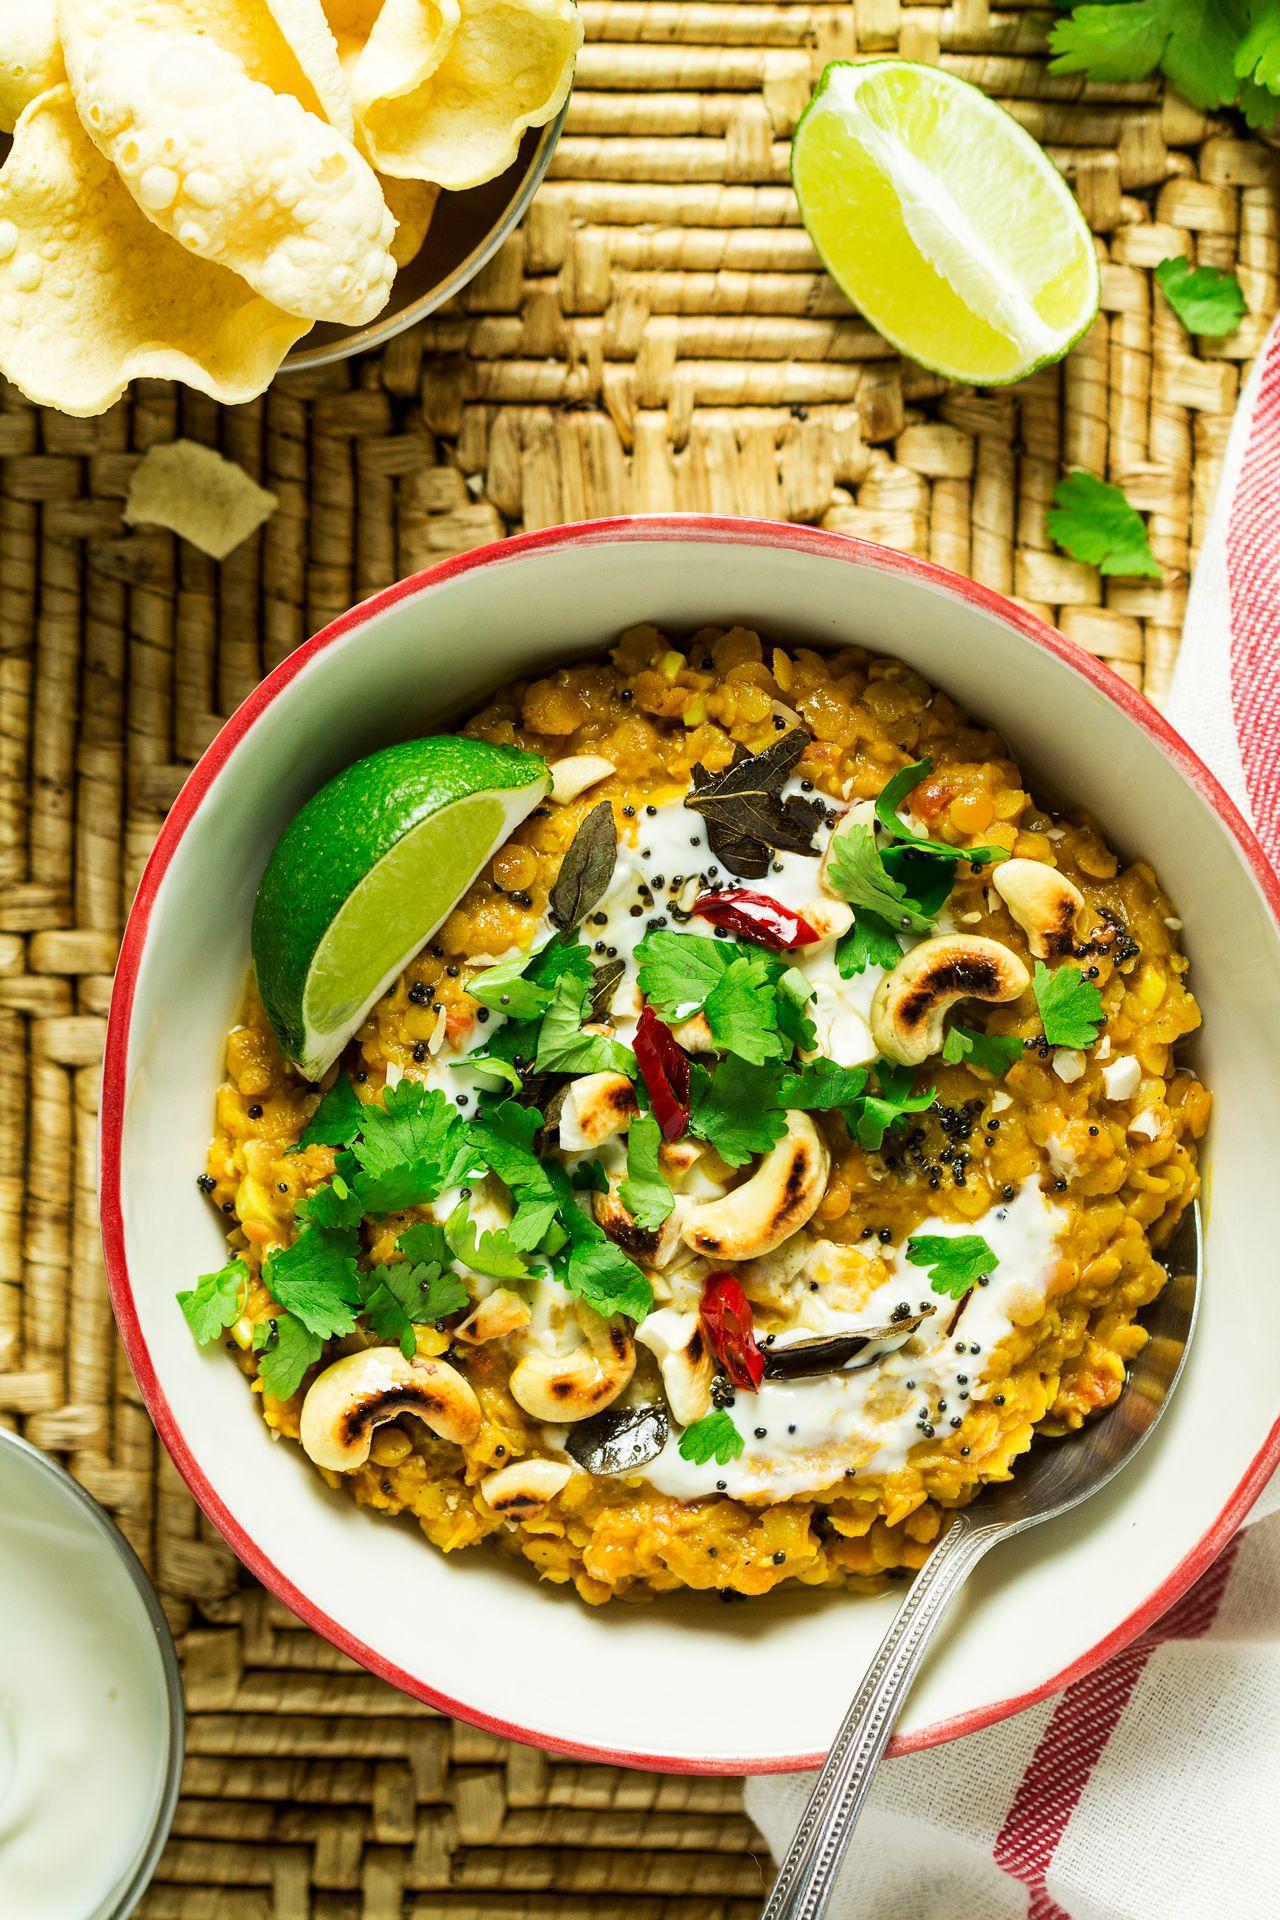 Vegan red lentil dhal Recipe Lazy cat kitchen, Dhal